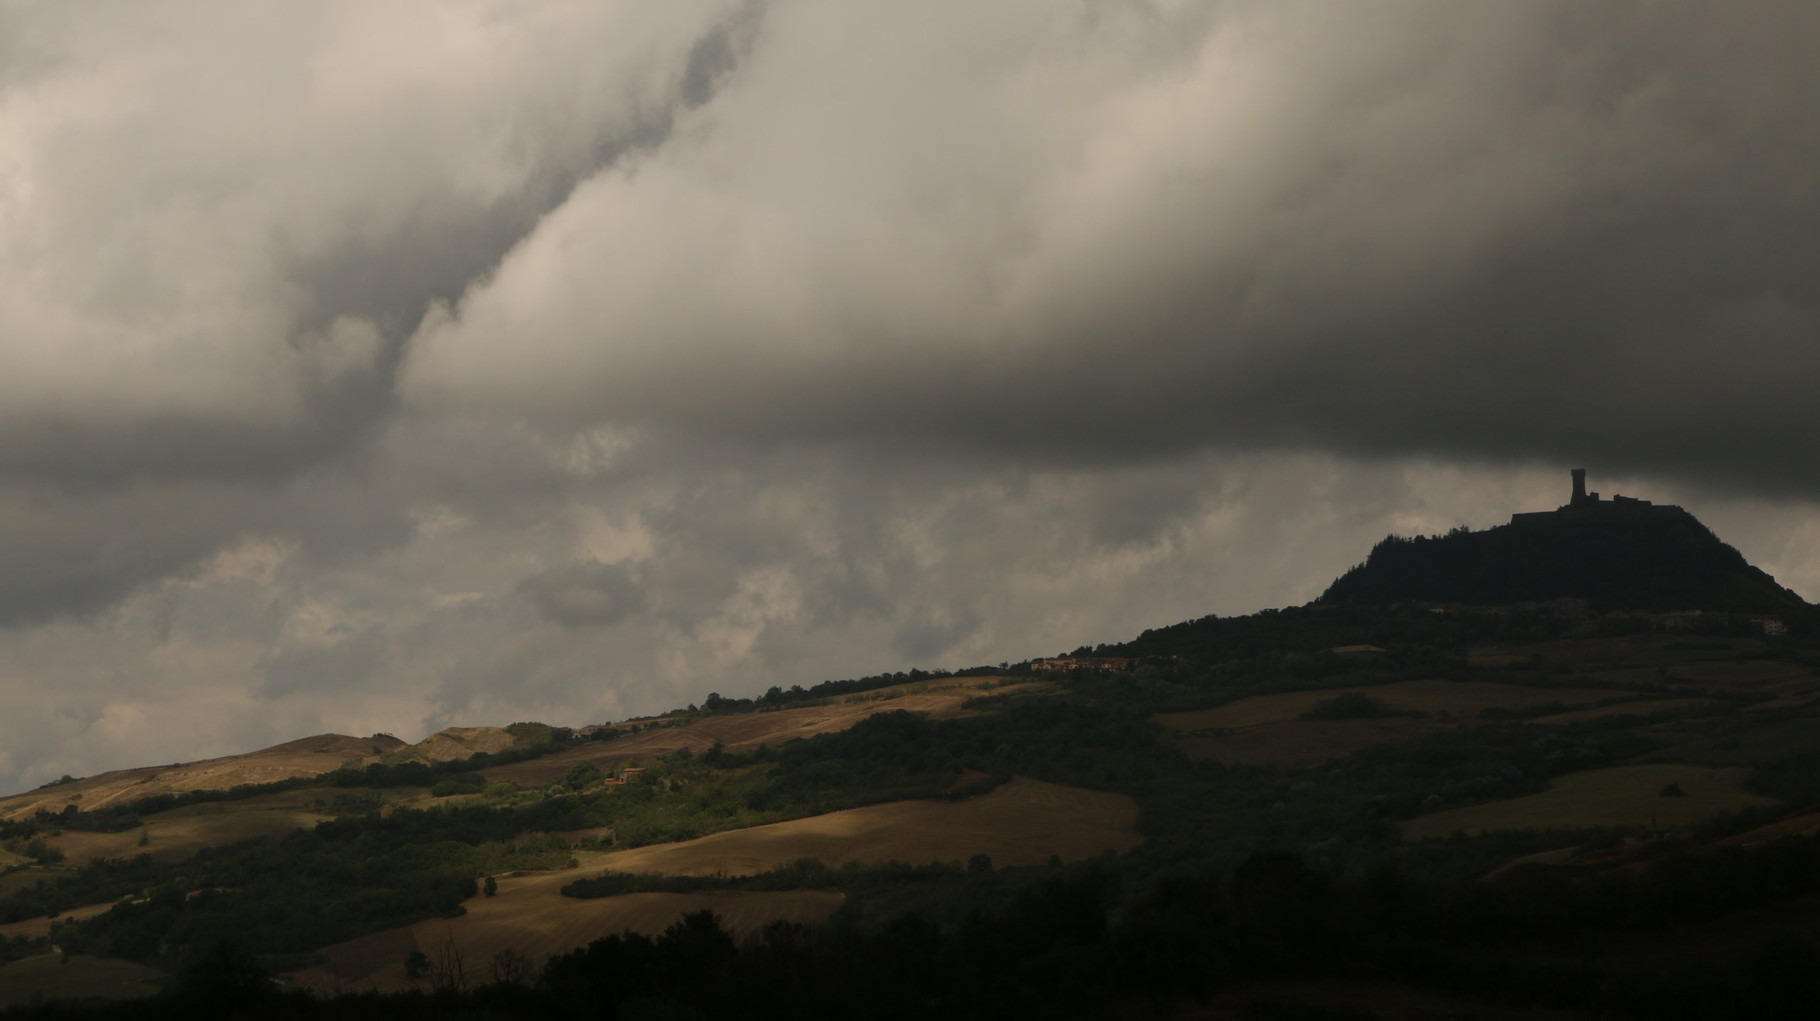 Tappa 36: Radicofani - Acquapendente | 24 km